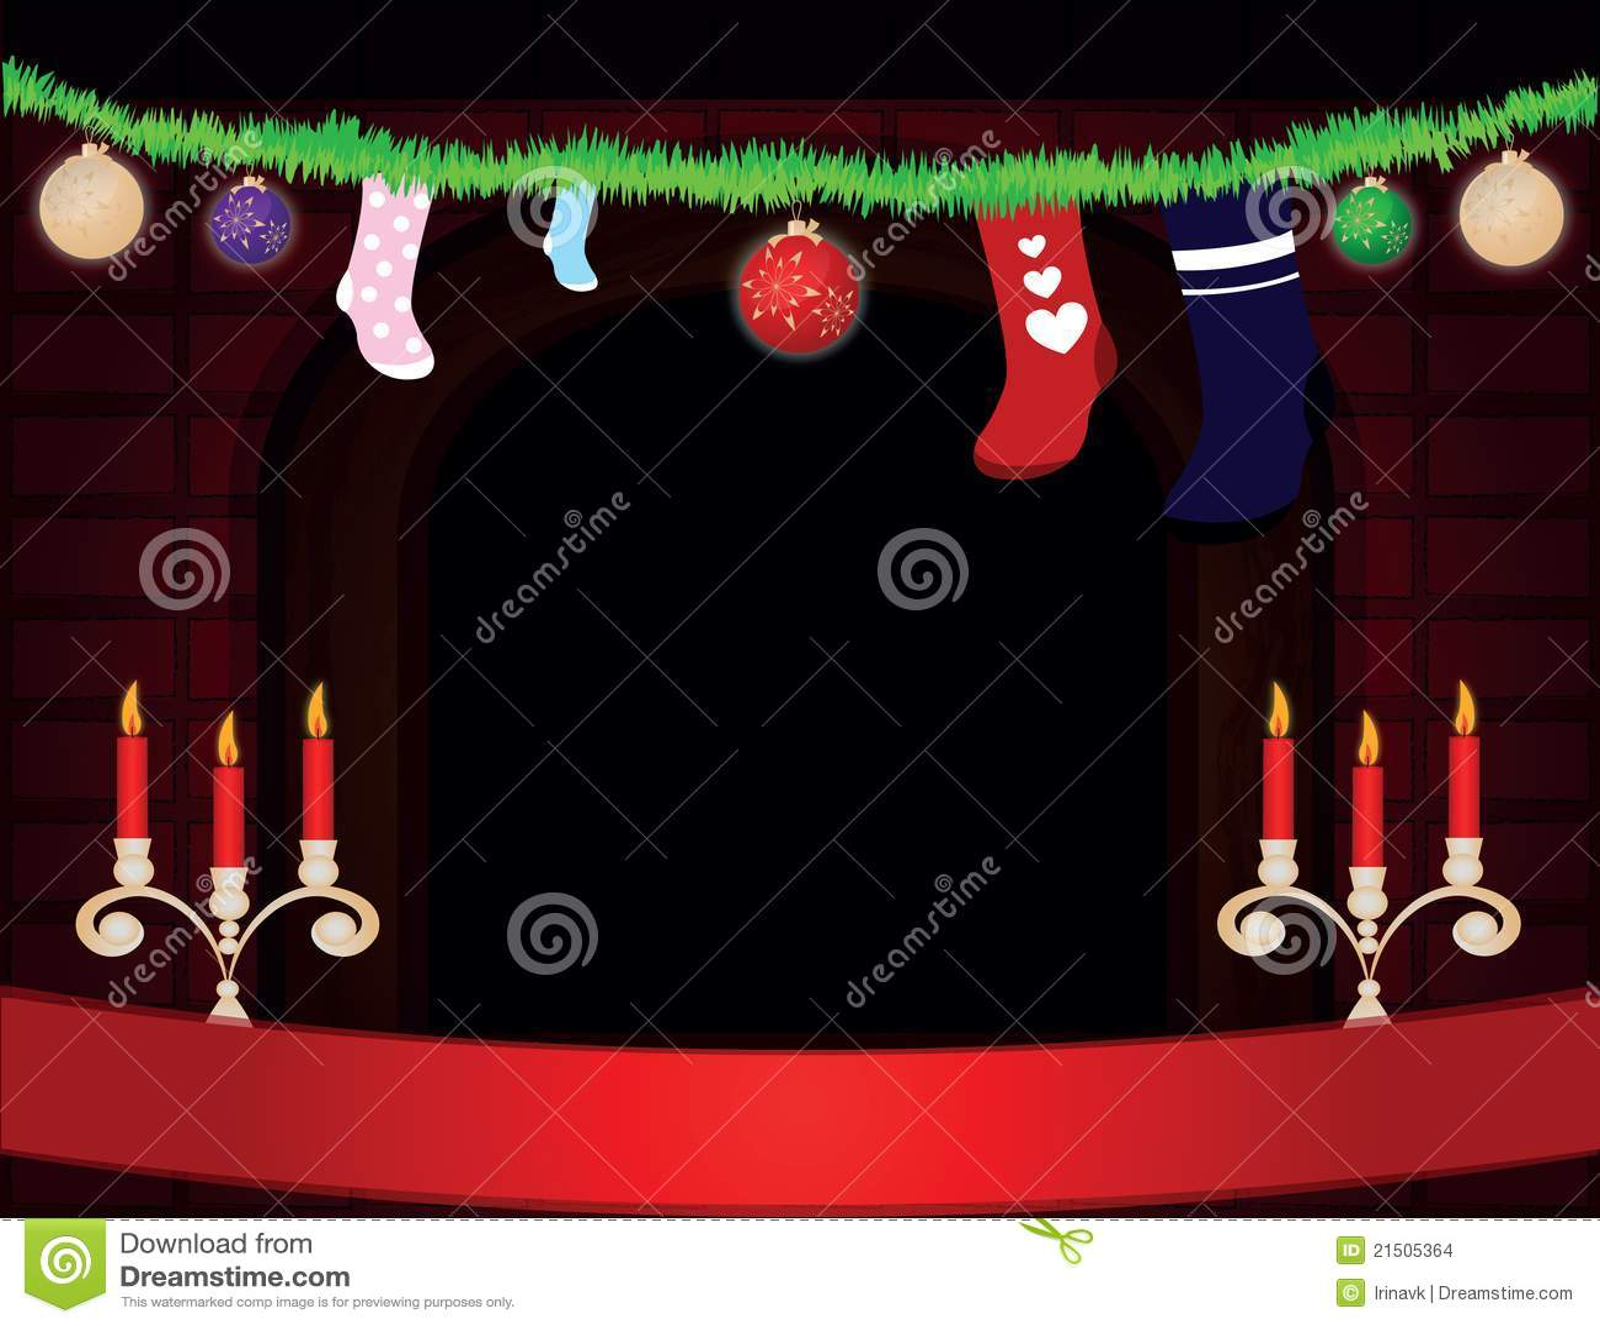 Christmas Room Stock Vector Image Of Illuminated: Christmas Room Stock Images